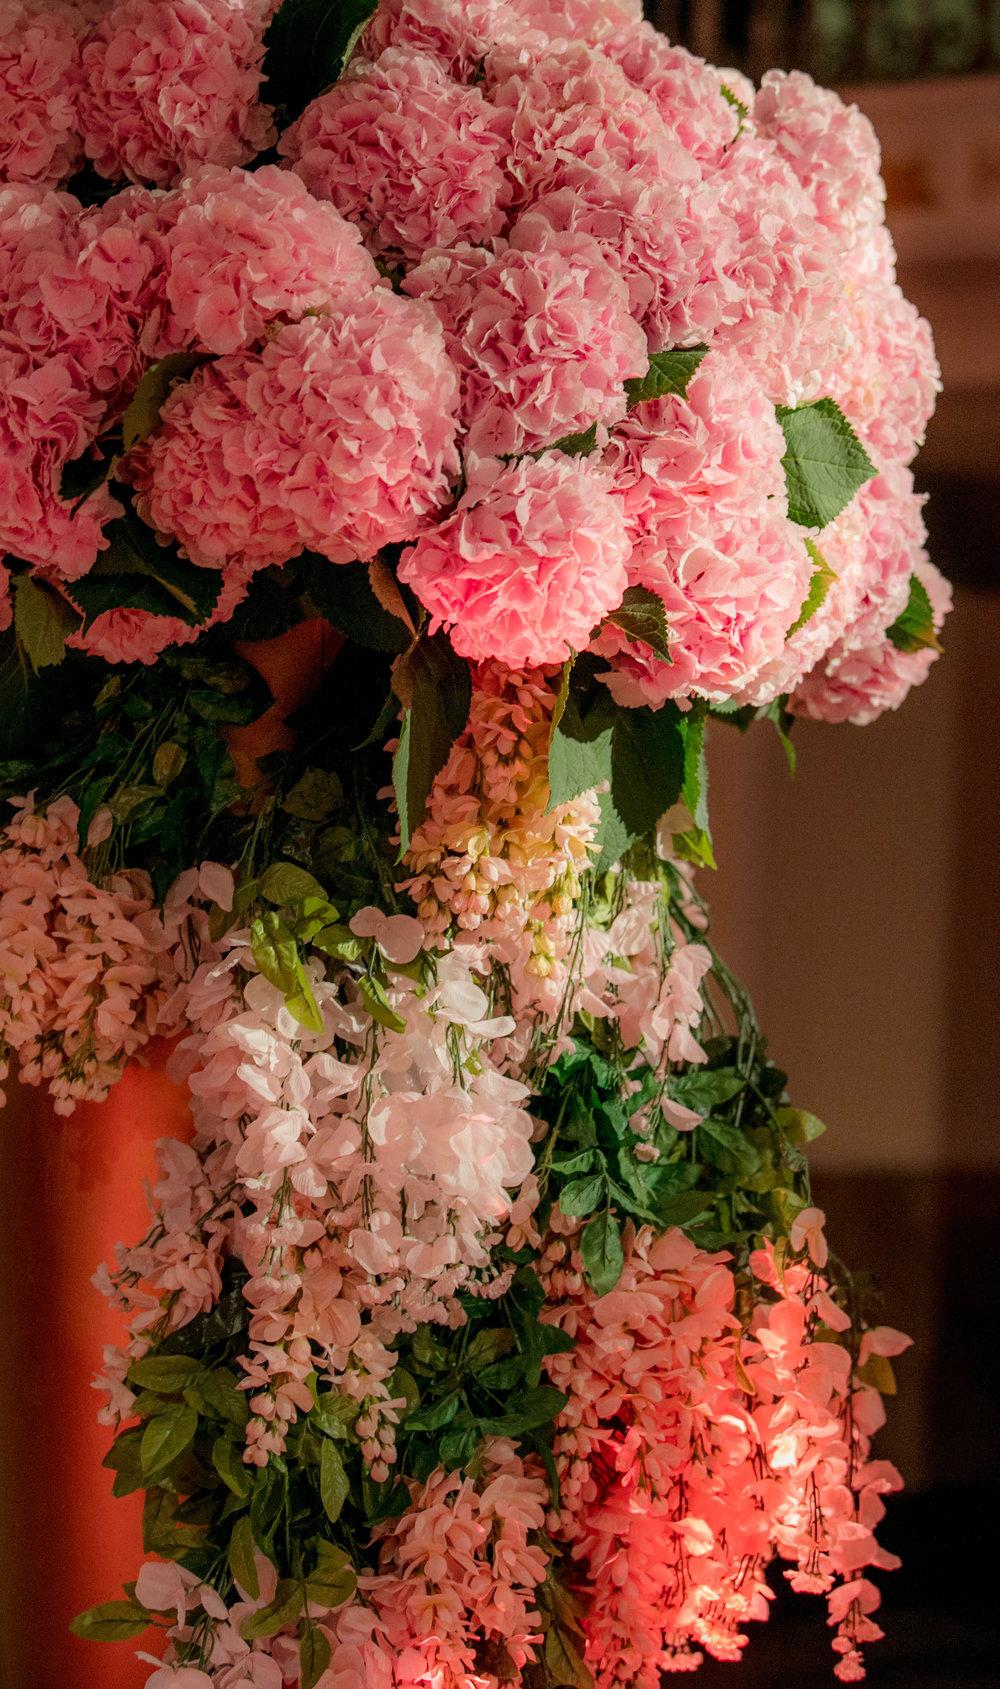 INDIAN WEDDING FLOWER DECOR.jpg